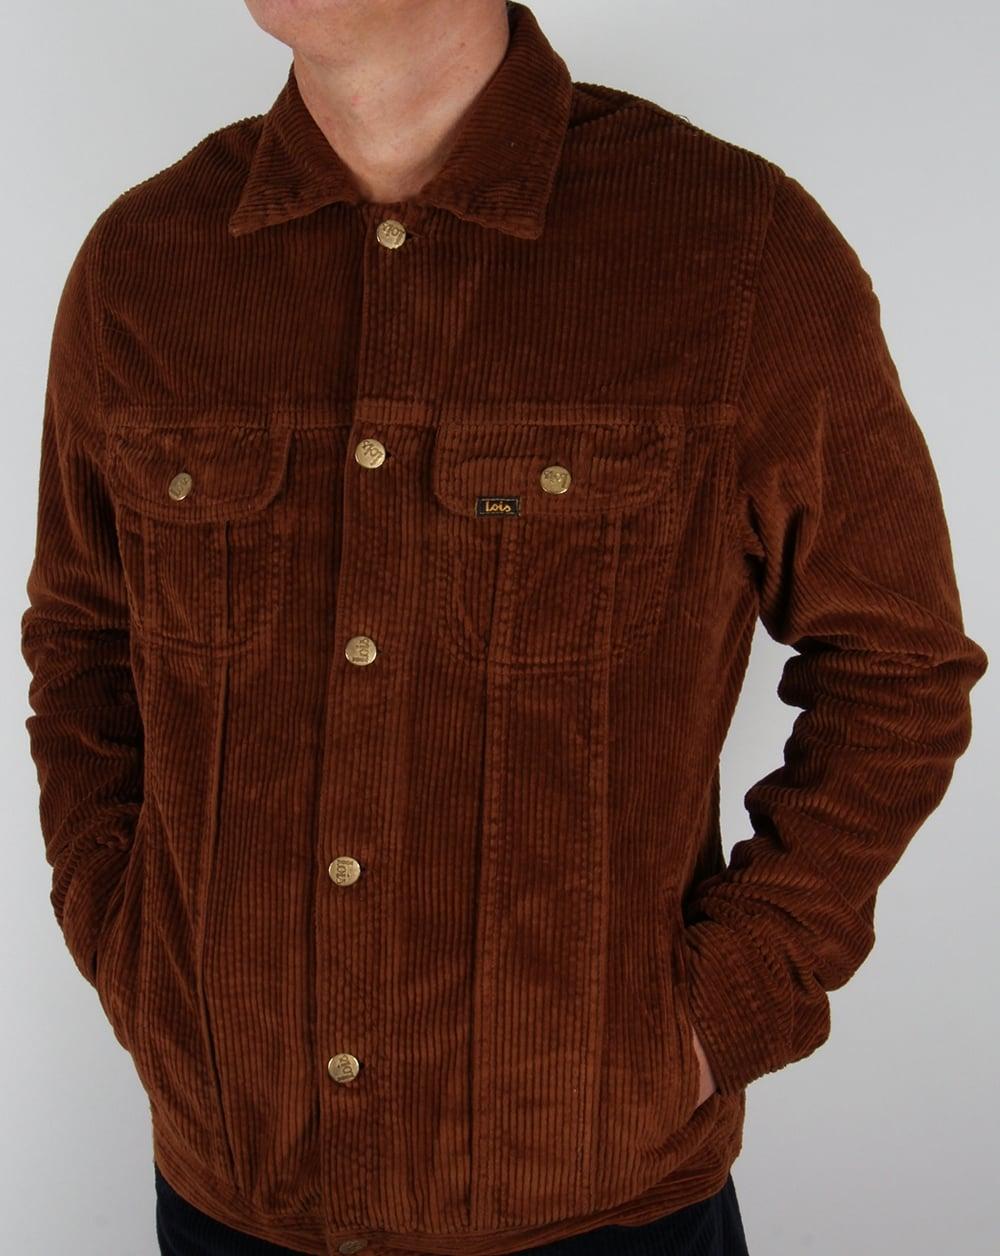 Lois Tejana Jumbo Cord Jacket Brown Coat Corduroy Mens